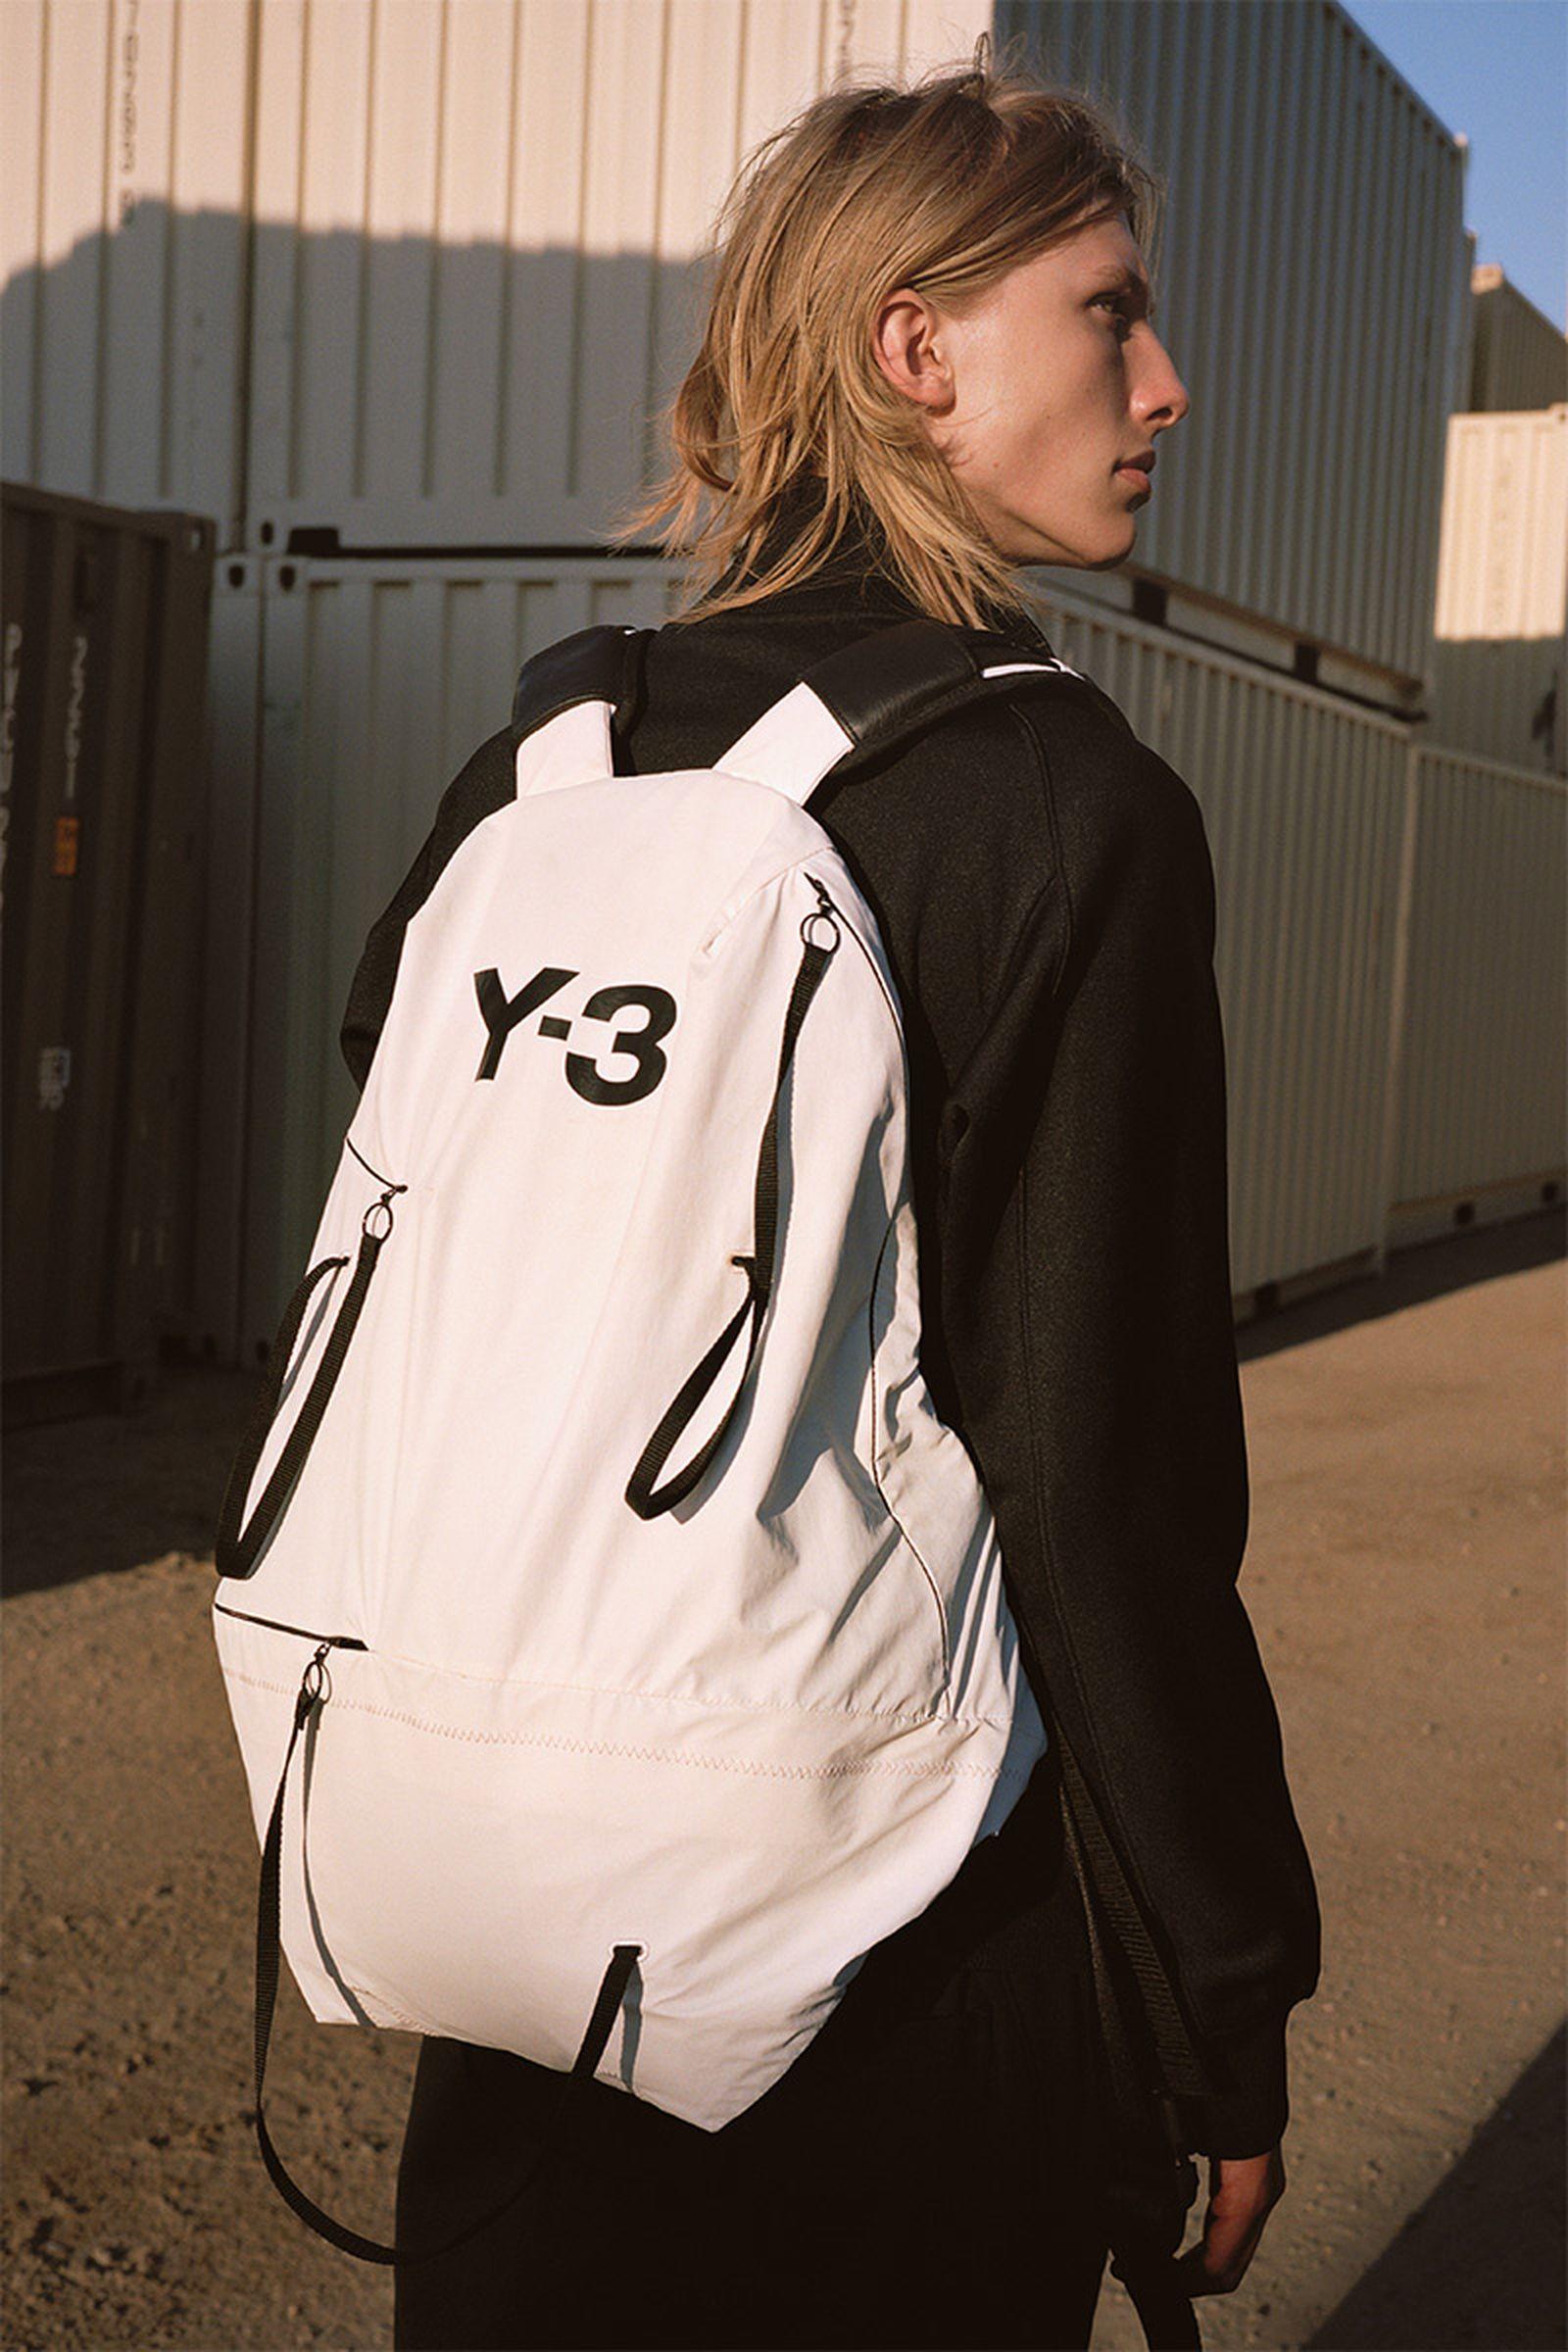 y 3 ss19 collection lookbook Adidas y-3 yohji yamamoto